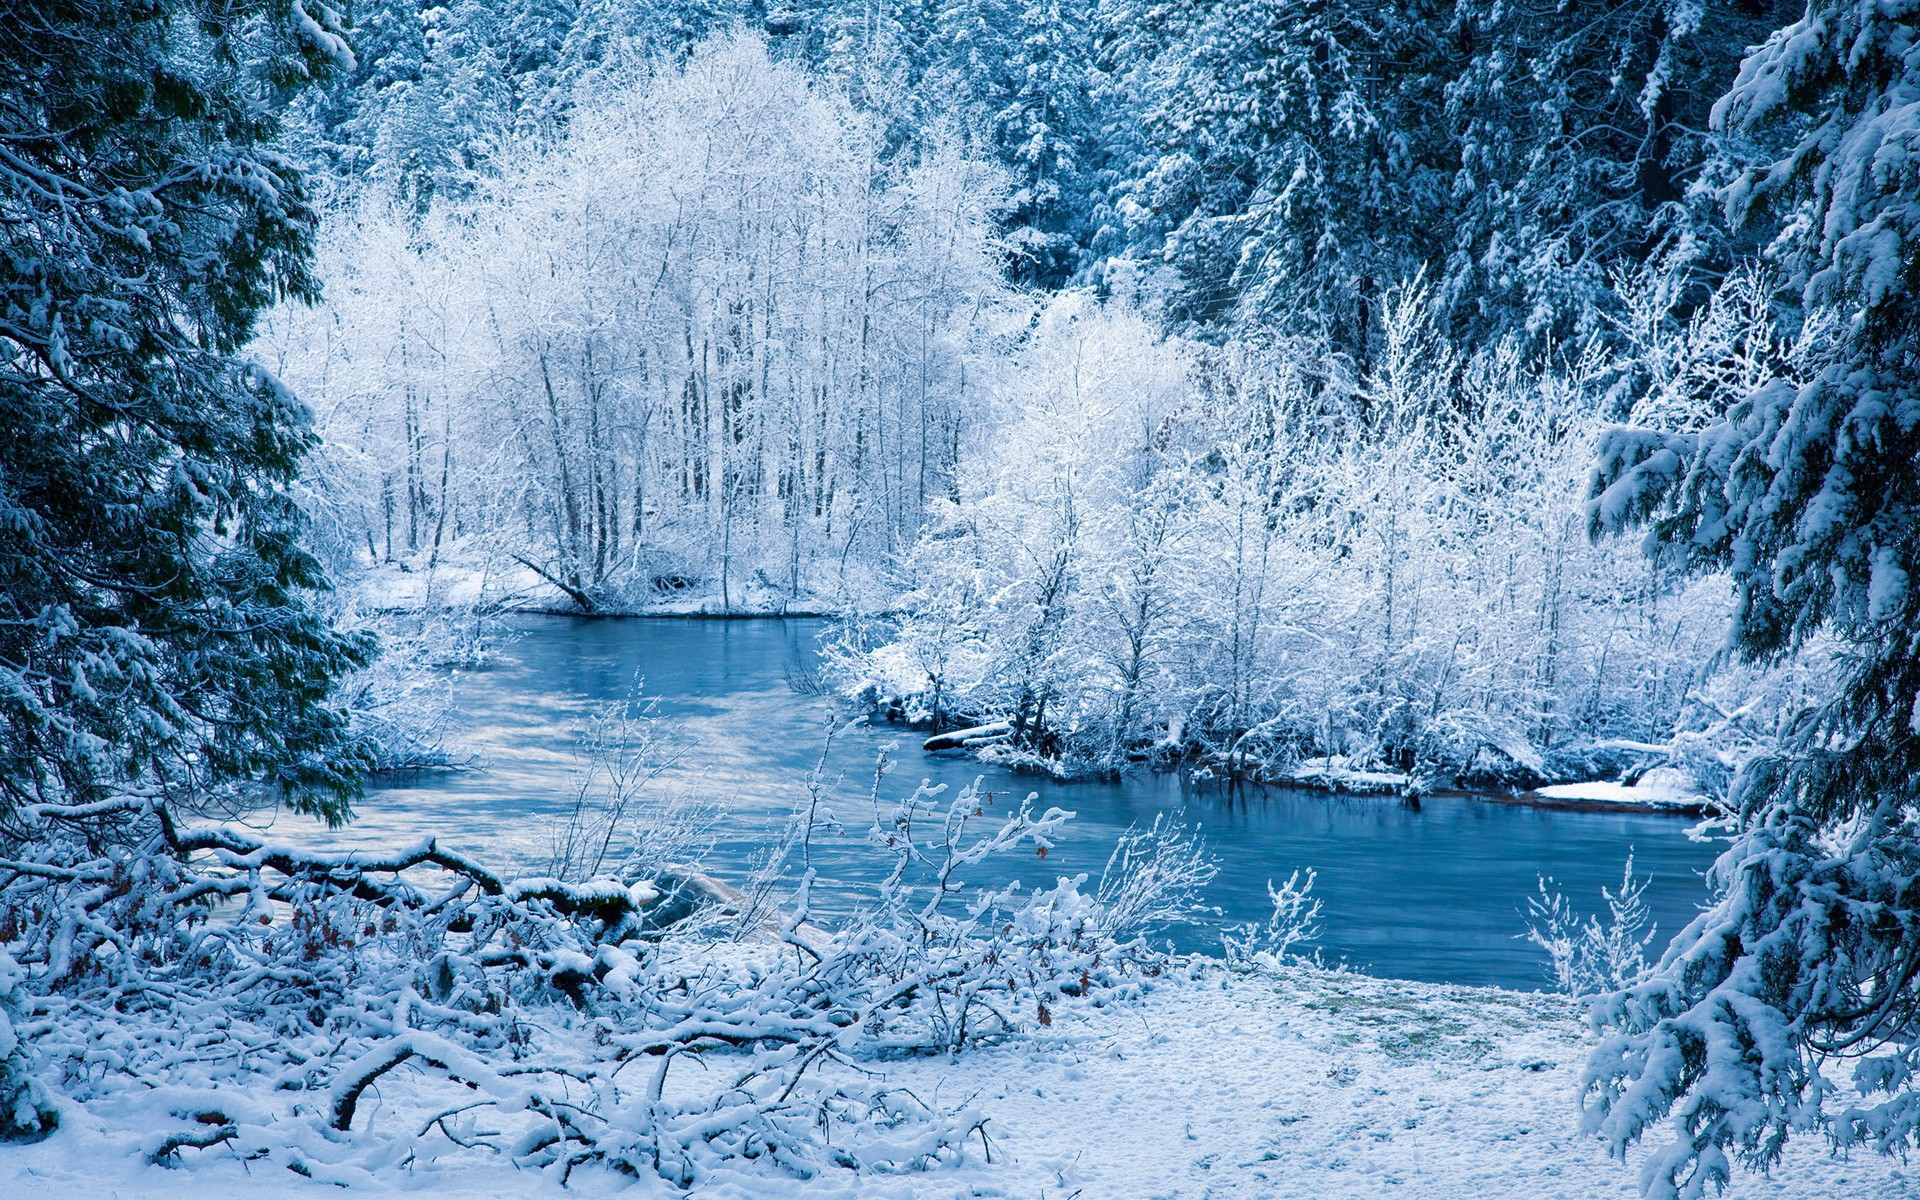 Winter Forest Desktop Wallpaper Wallpapersafari